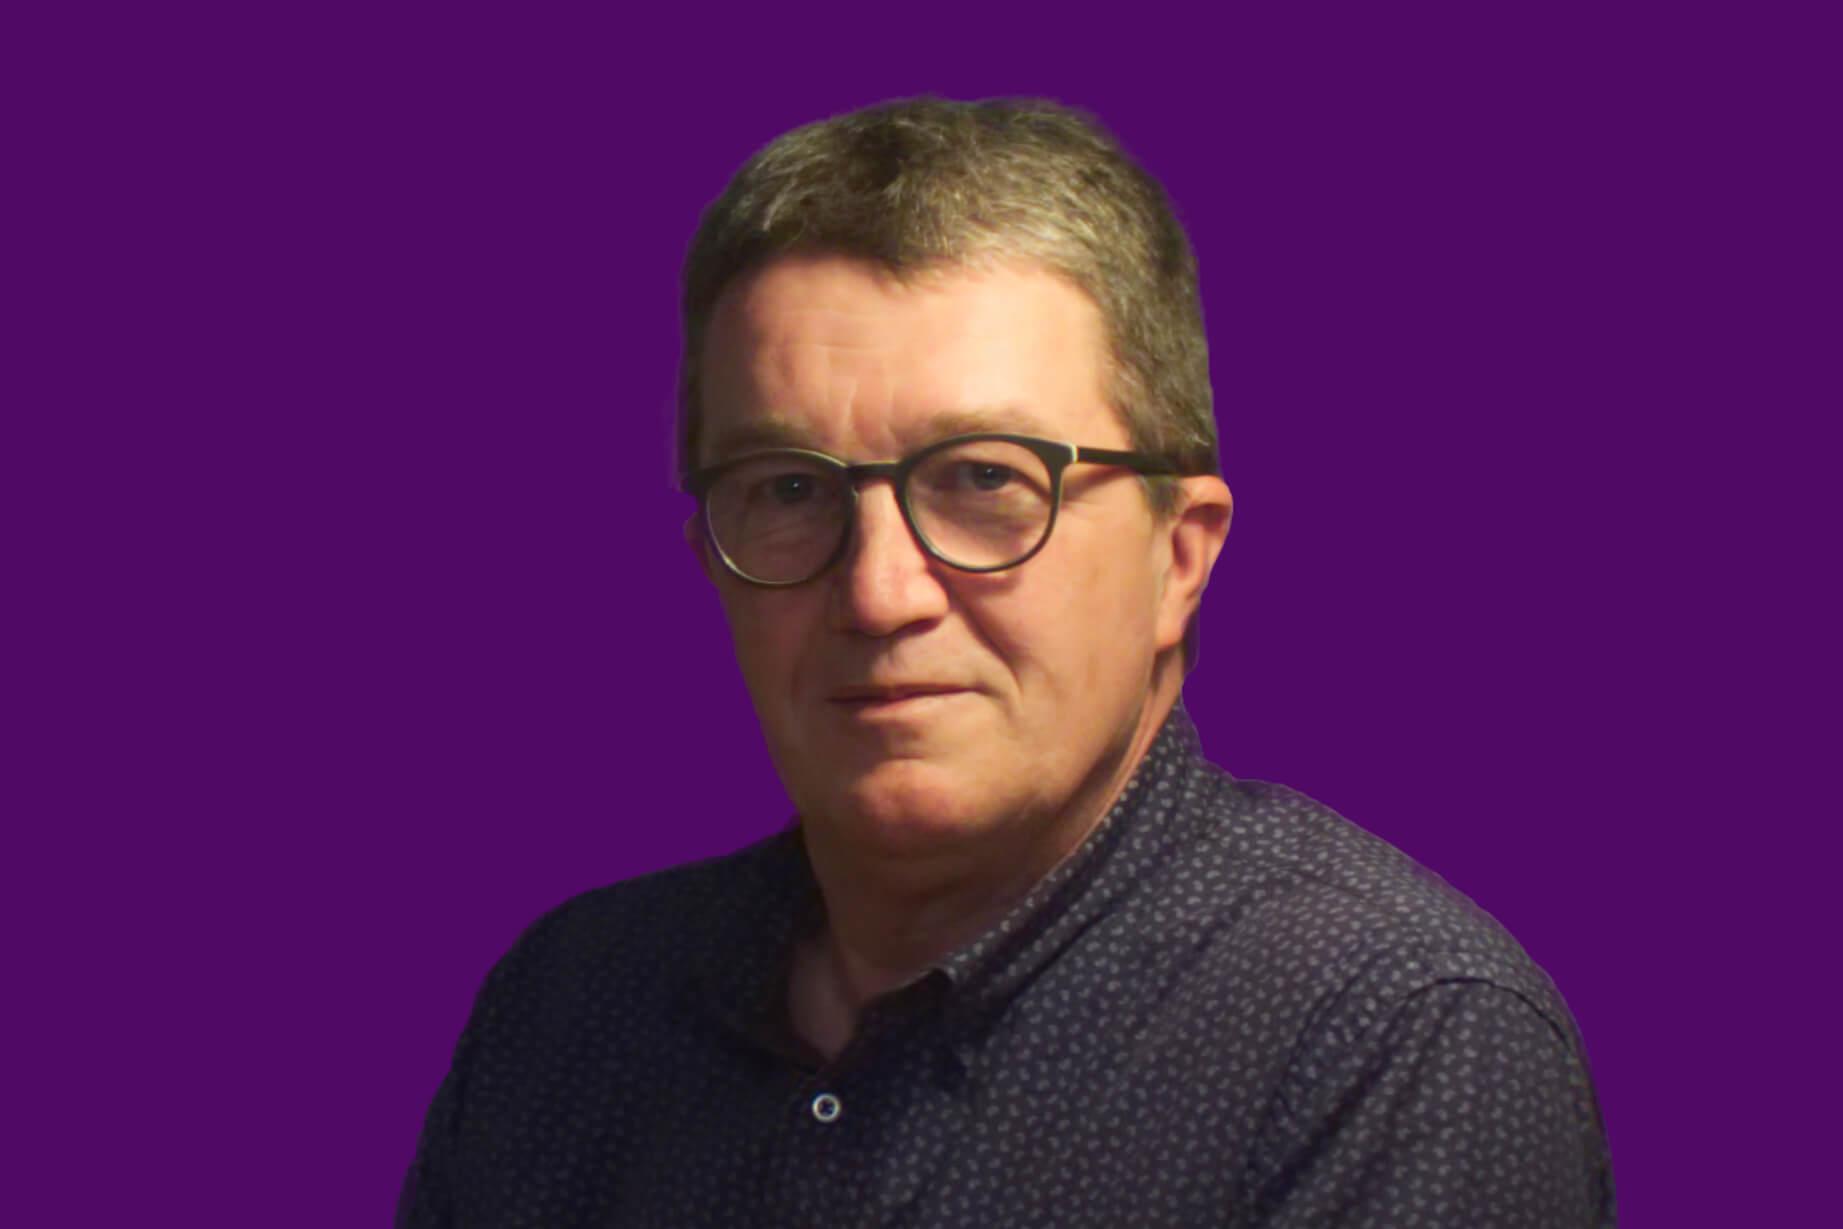 Patrick Burkhardt